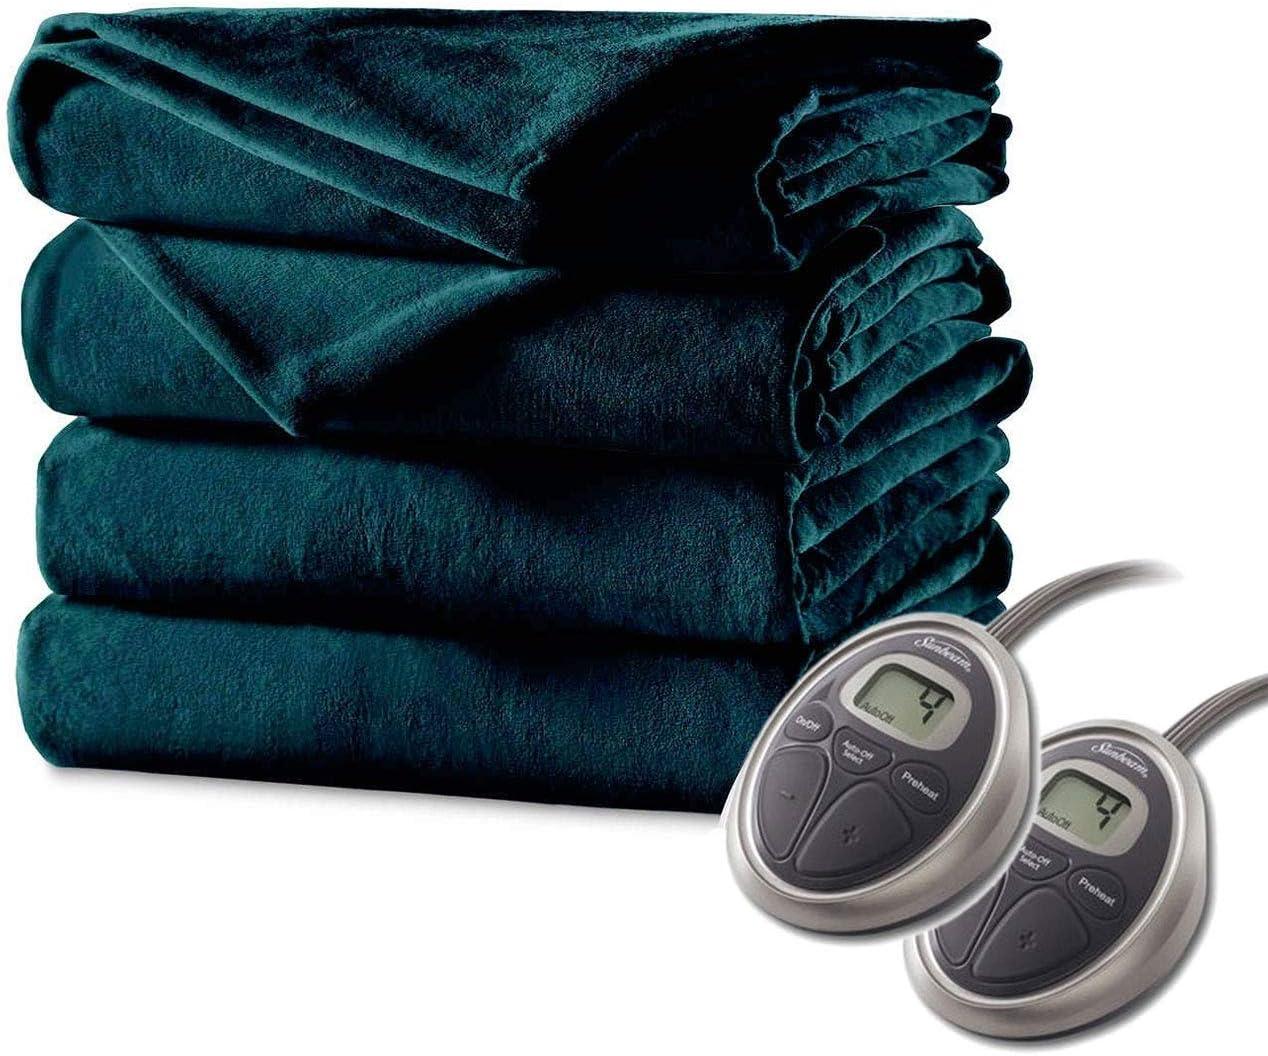 Sunbeam Luxurious Electric Heated Blanket Premium Plush, Auto Shut-Off, 20 Heat Settings,Two Controllers, King (Deep Sea Blue)